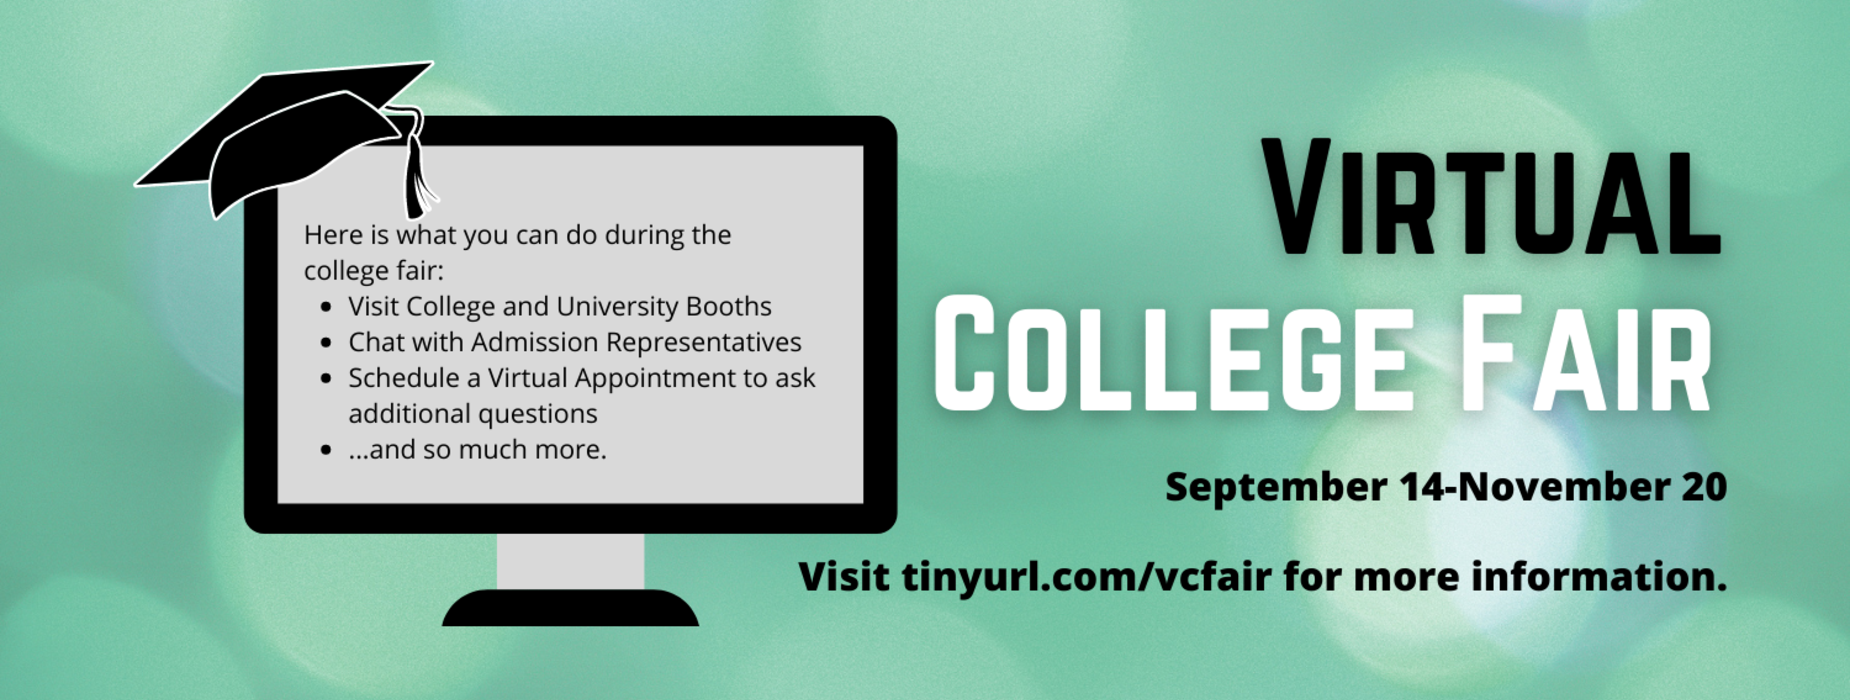 Virtual College Fair advertisement